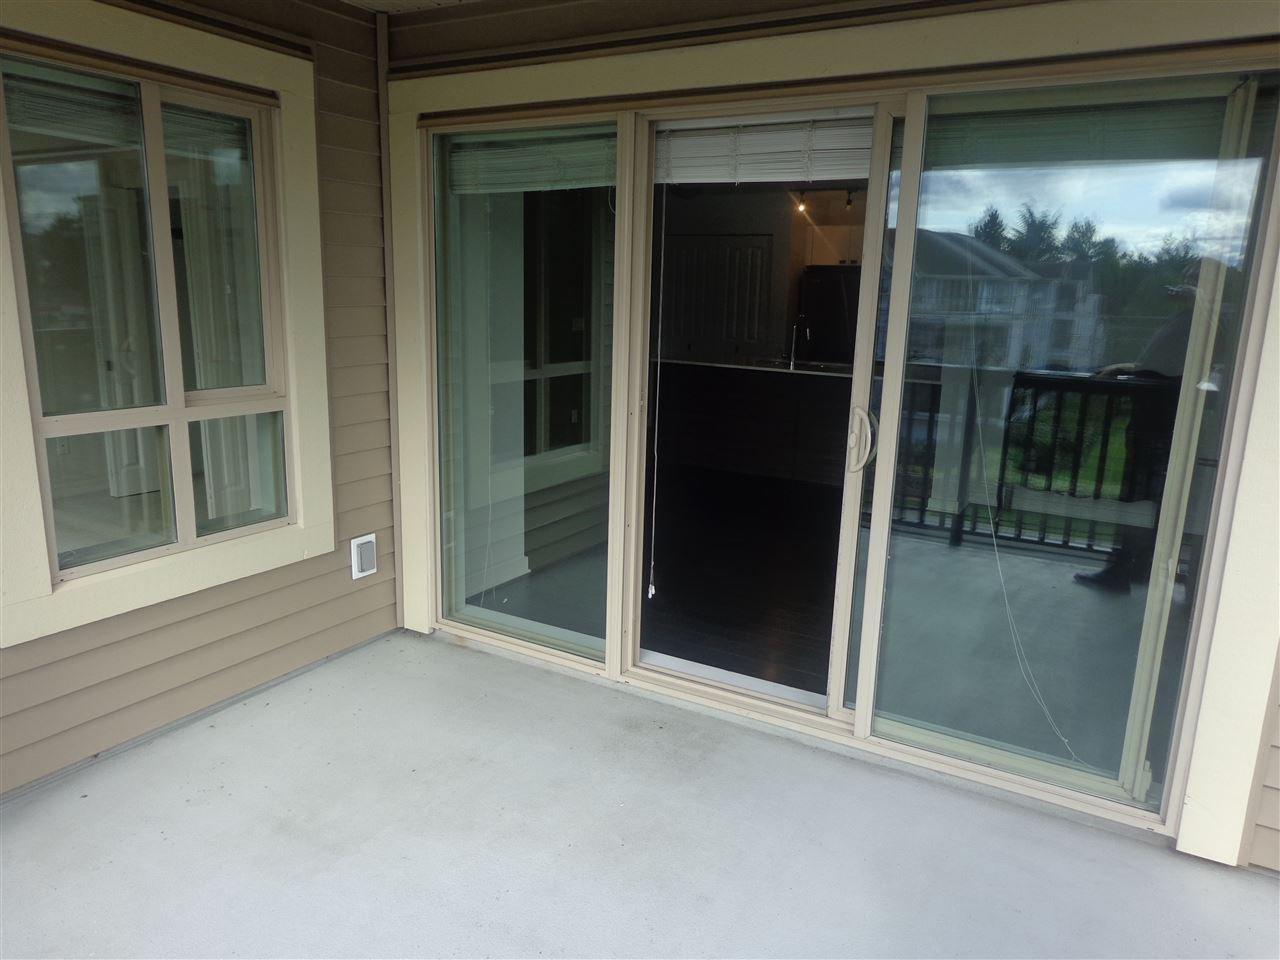 "Photo 15: Photos: 321 21009 56 Avenue in Langley: Salmon River Condo for sale in ""CORNERSTONE"" : MLS®# R2409598"